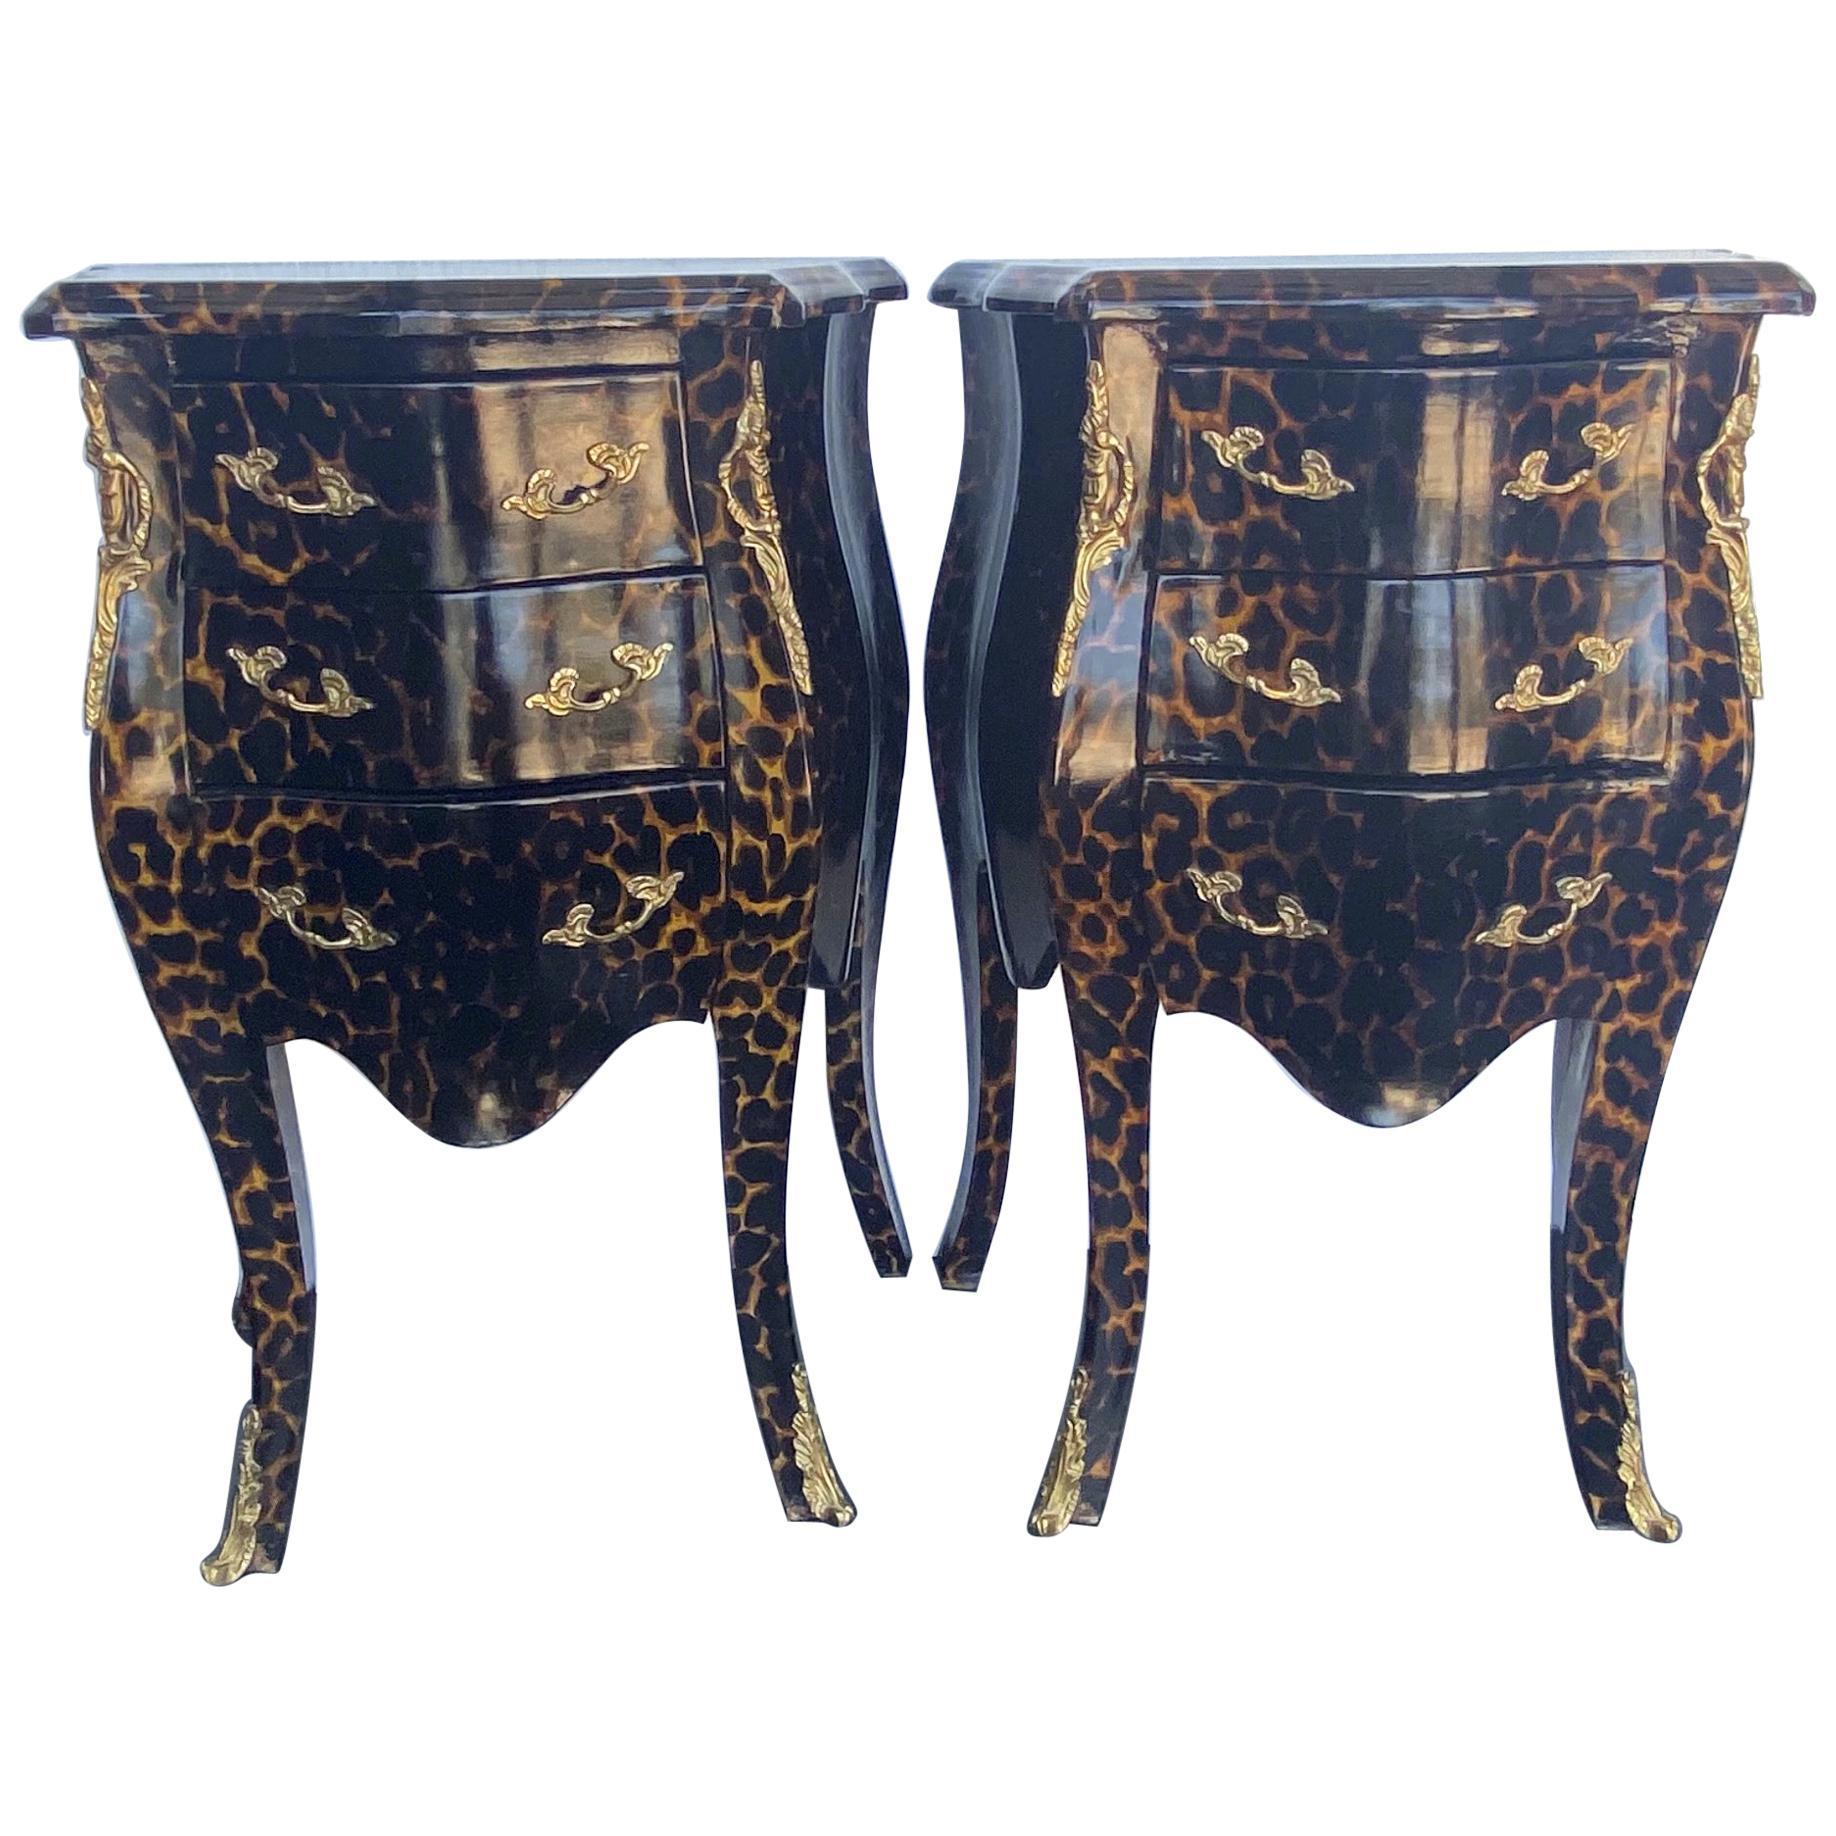 Pair of Louis XV Style Petite Nightstands